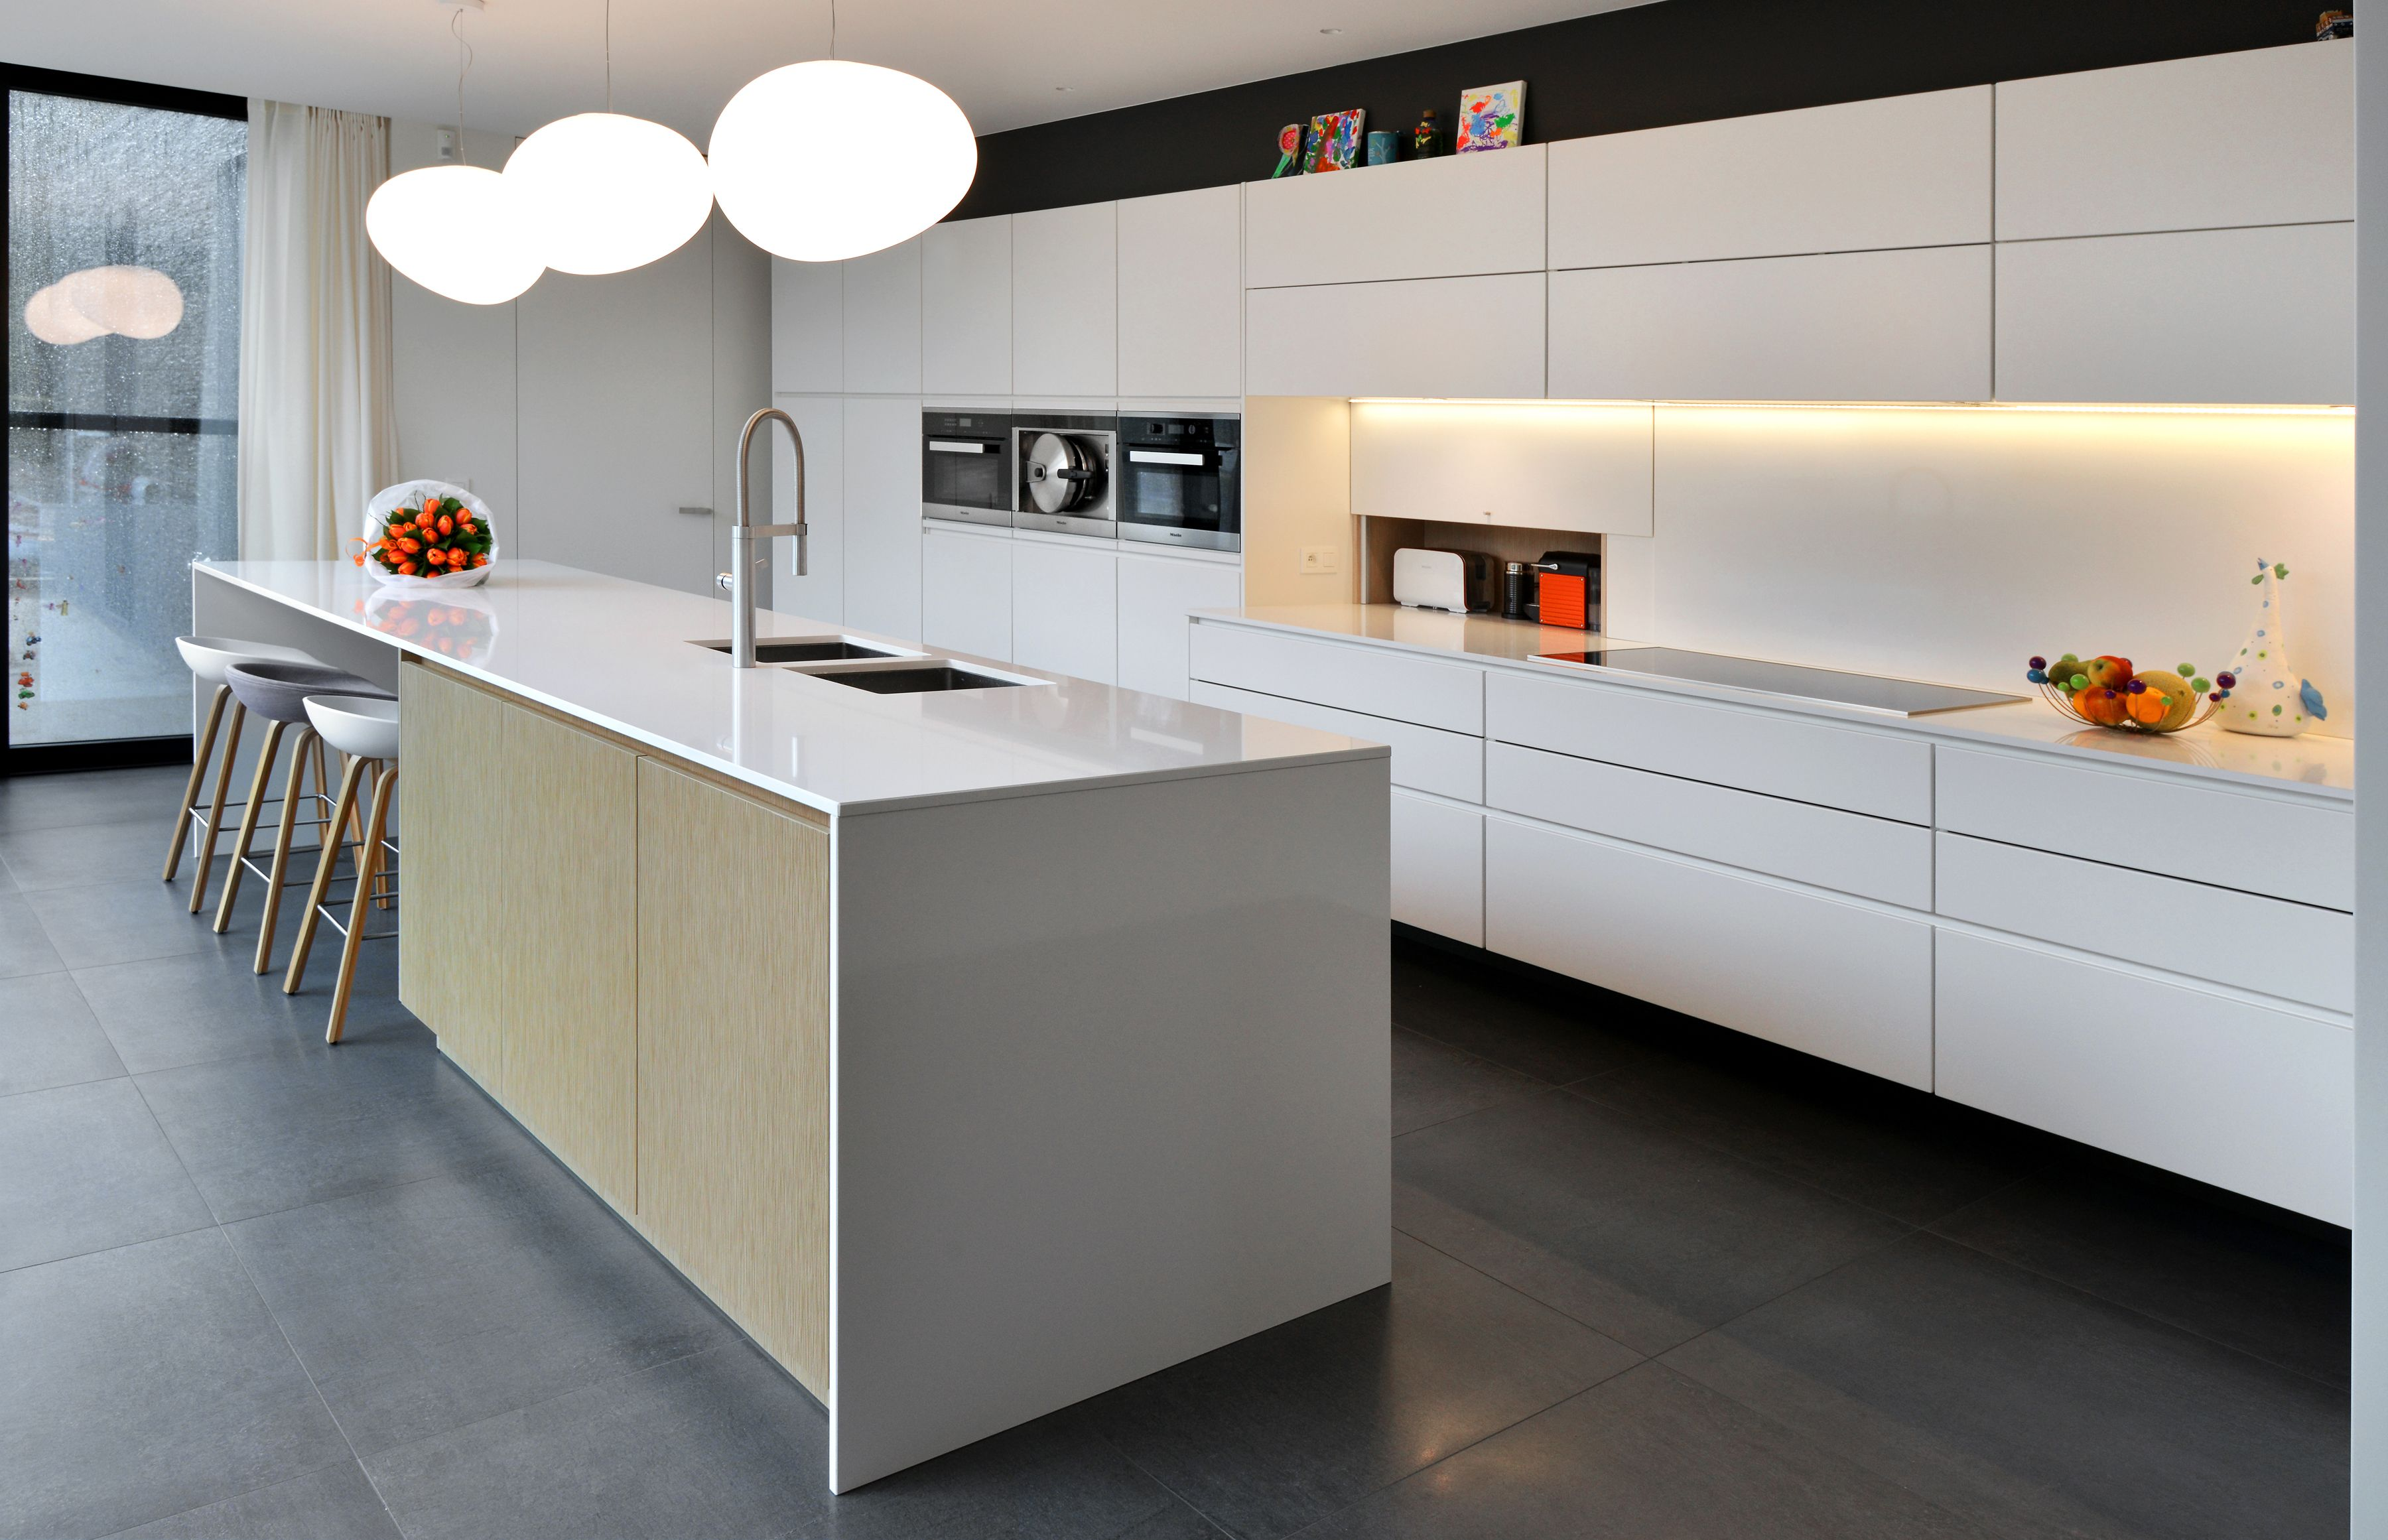 Keuken maarten smeets interieur ontwerp architectuur modern